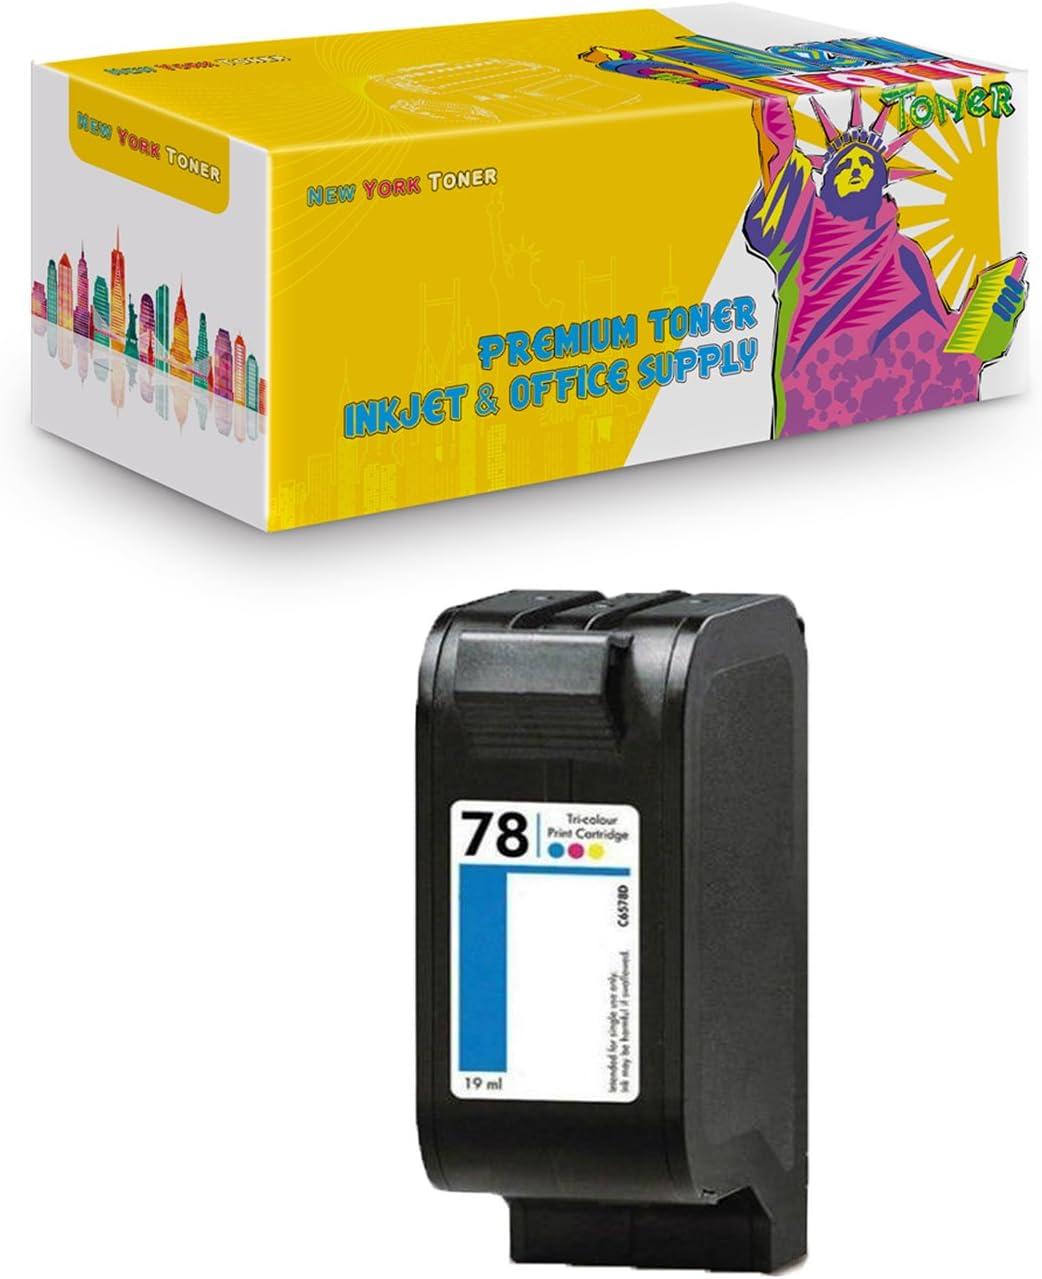 New York Toner Compatible Toner Cartridge Replacement for HP C6578DN 78 712C( Cyan, Magenta, Yellow , 1 pk )